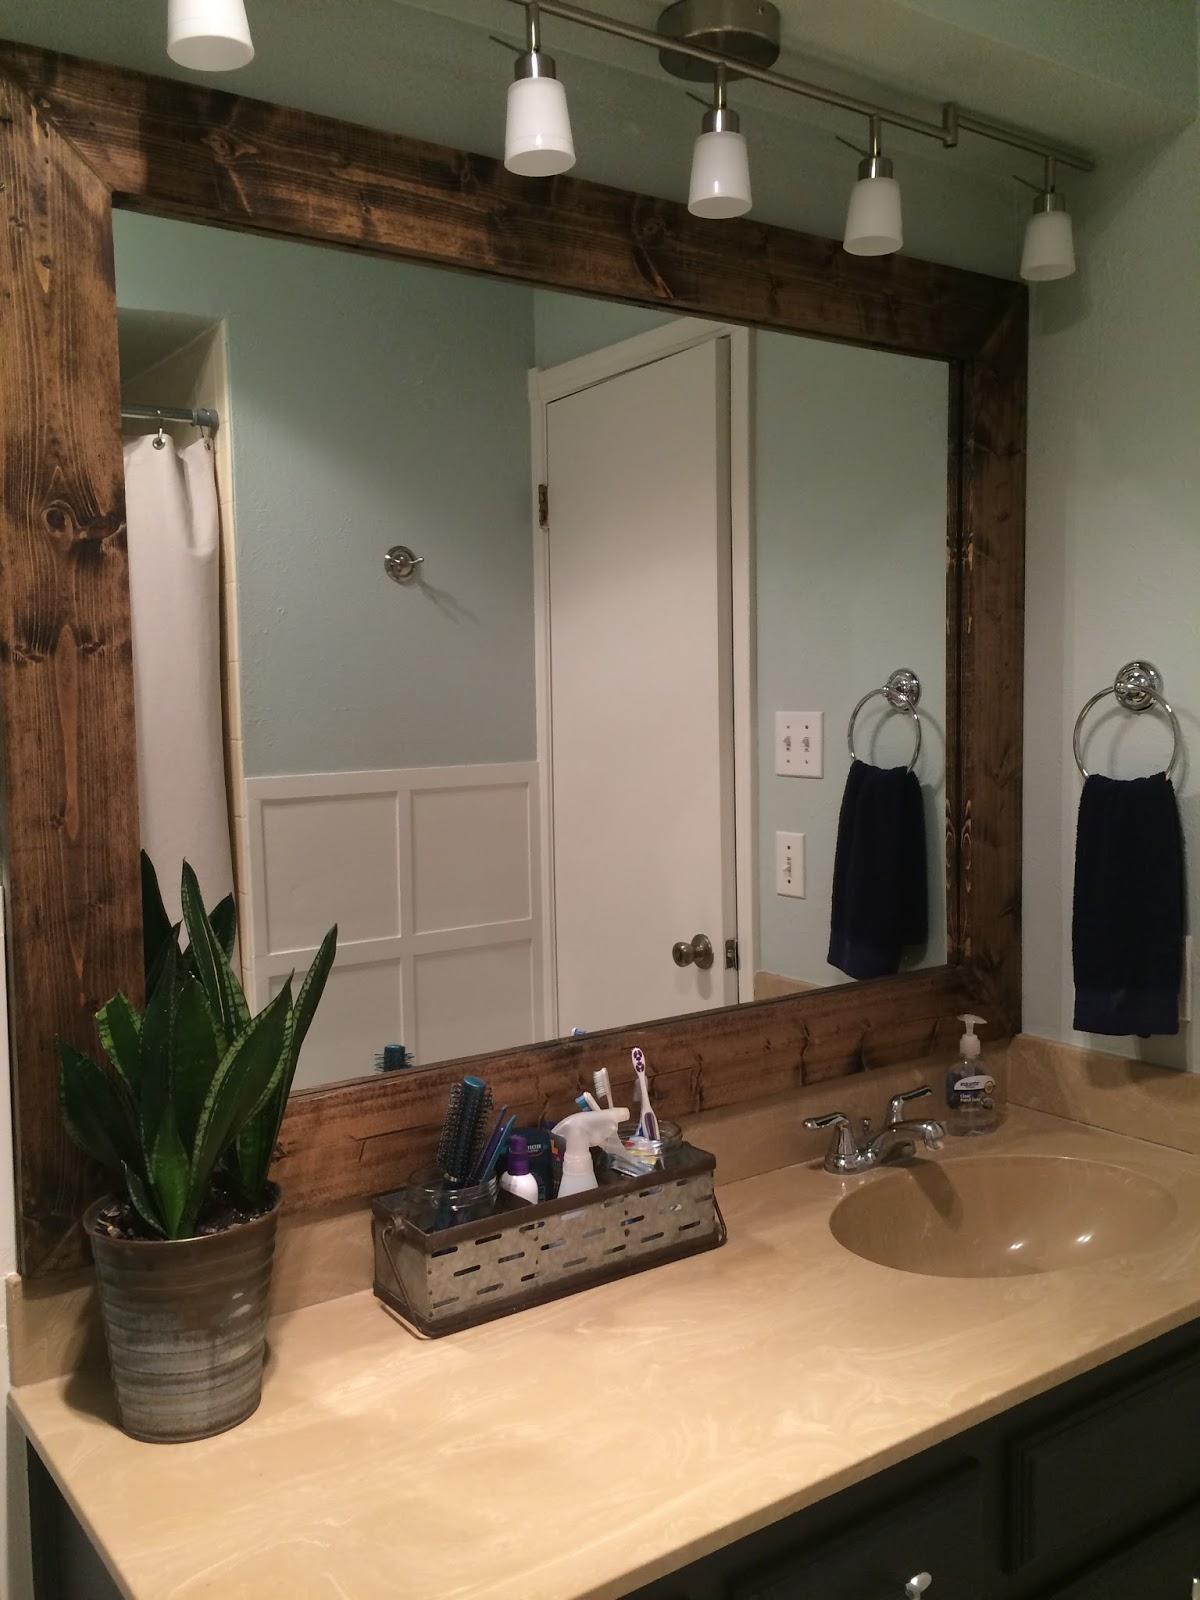 Bathroom Makeover e Room Challenge Reveal frazzled JOY